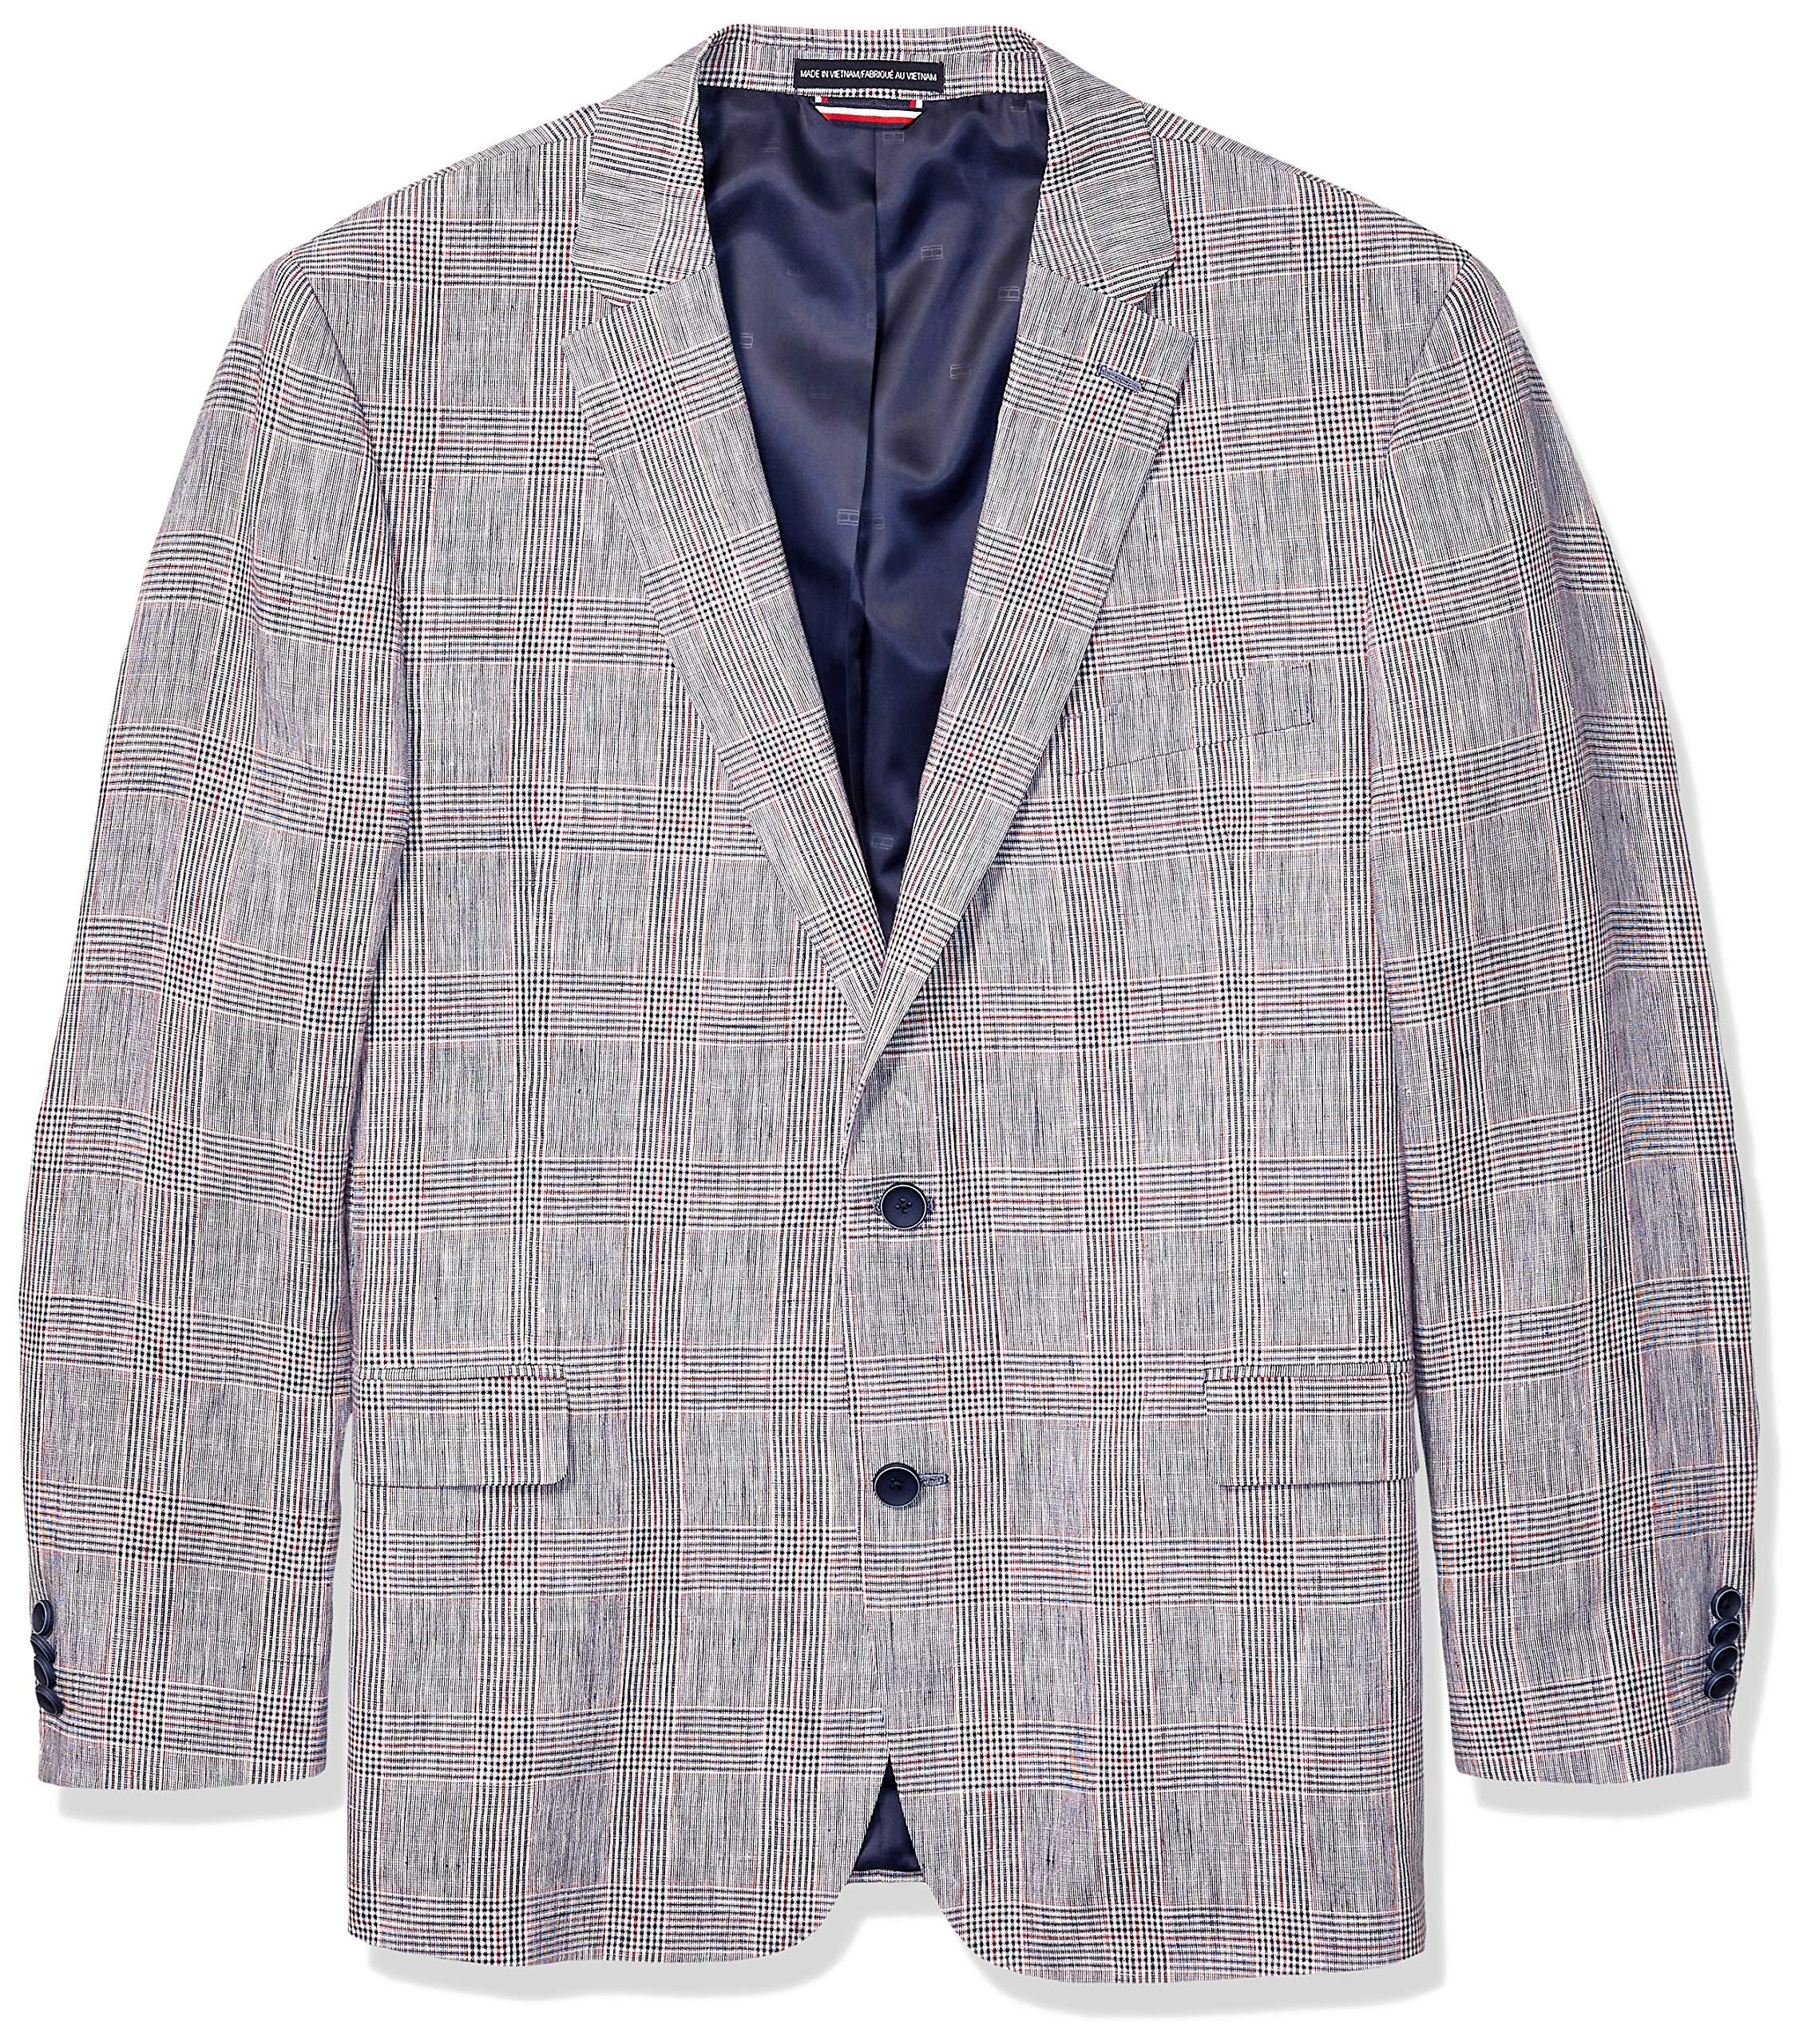 Tommy Hilfiger Men's Big and Tall Modern Fit Stretch Comfort Blazer, USA Plaid, 48R